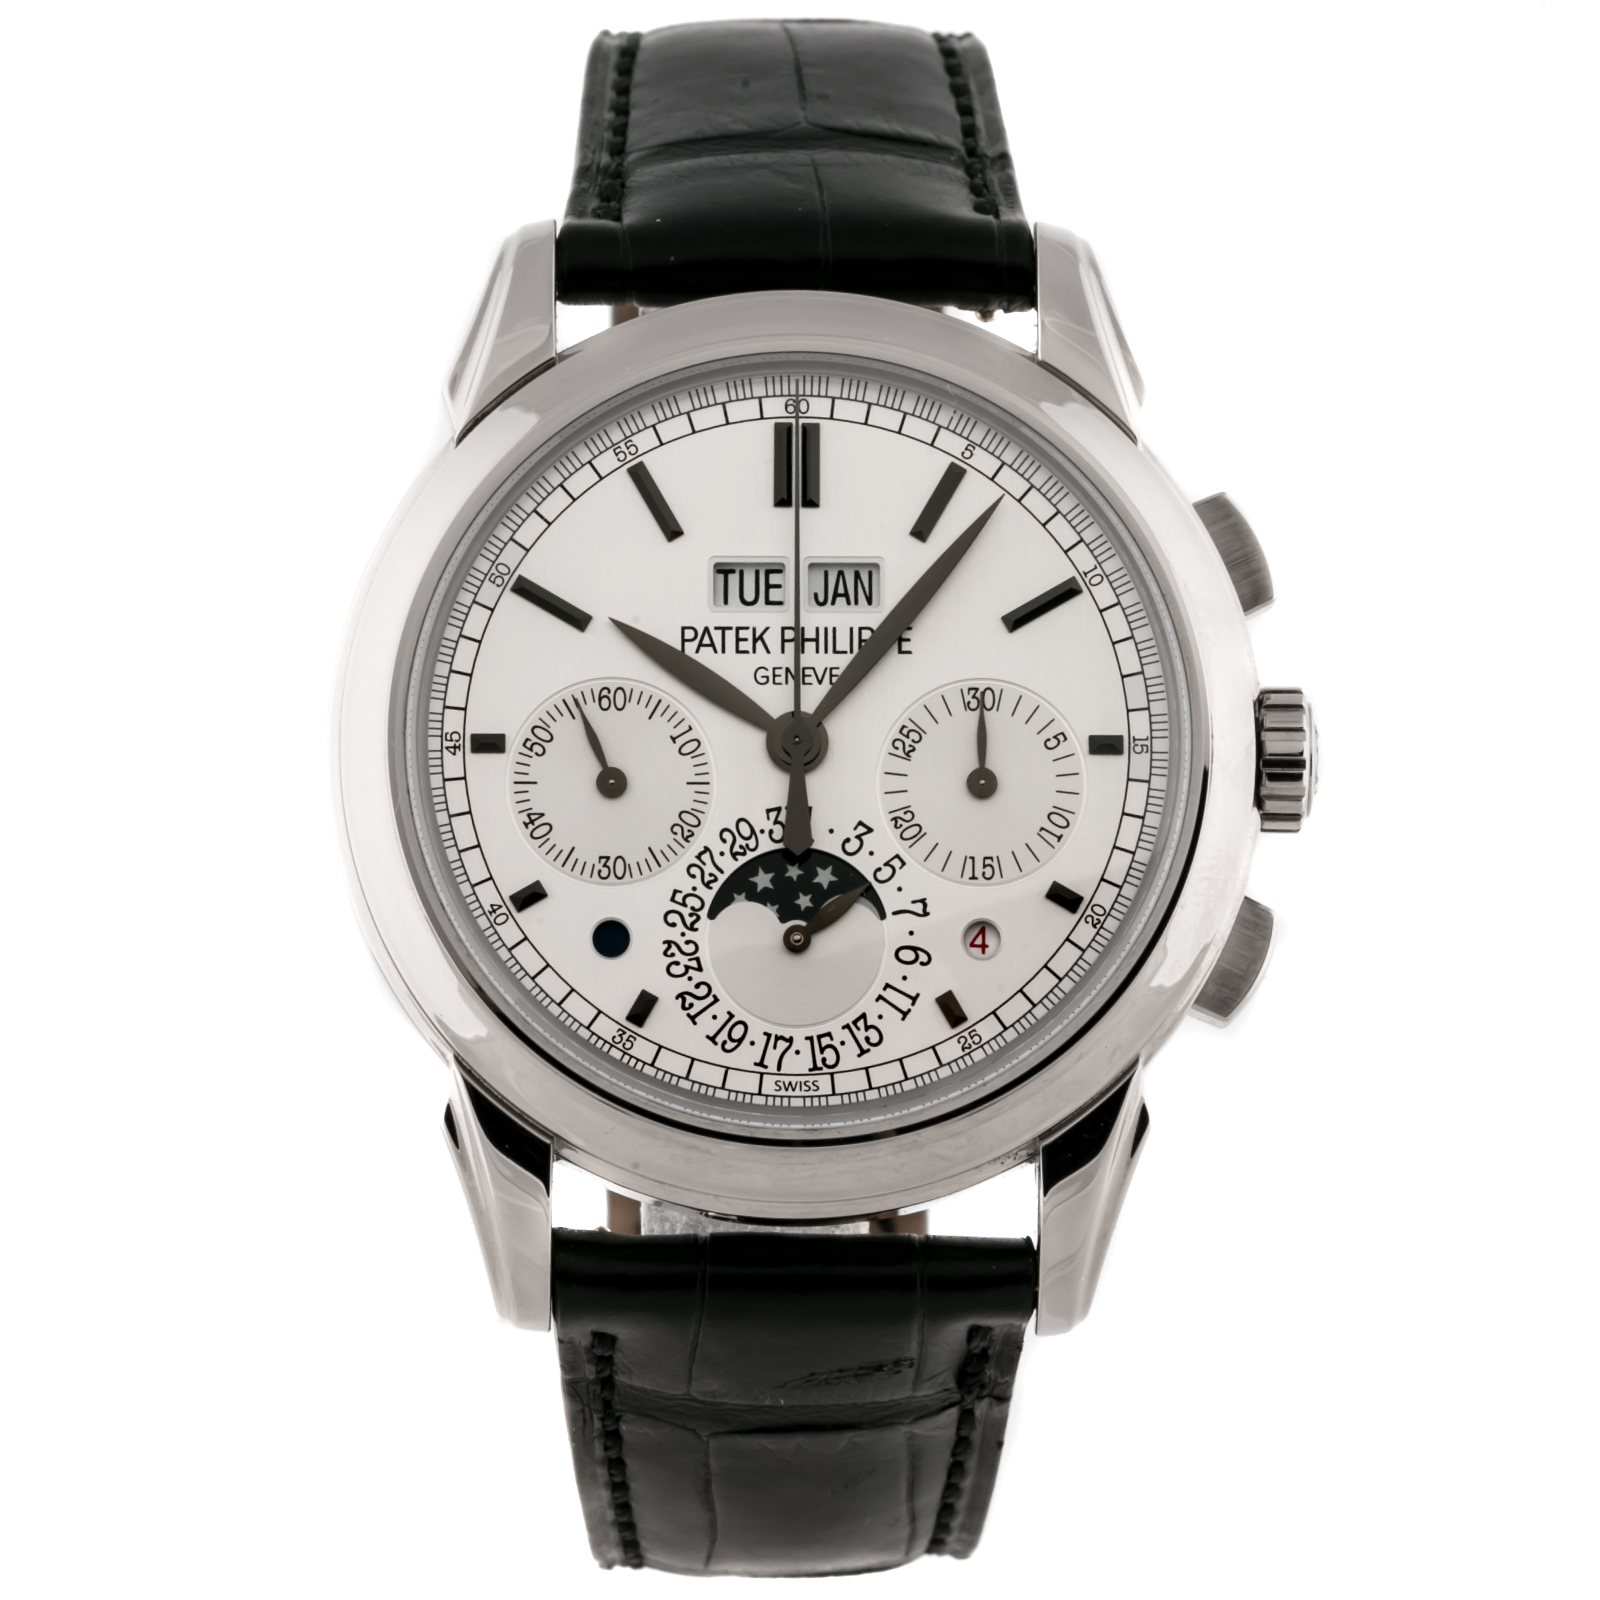 Patek Philippe Grand Complications Perpetual Calendar Chronograph 5270G-001